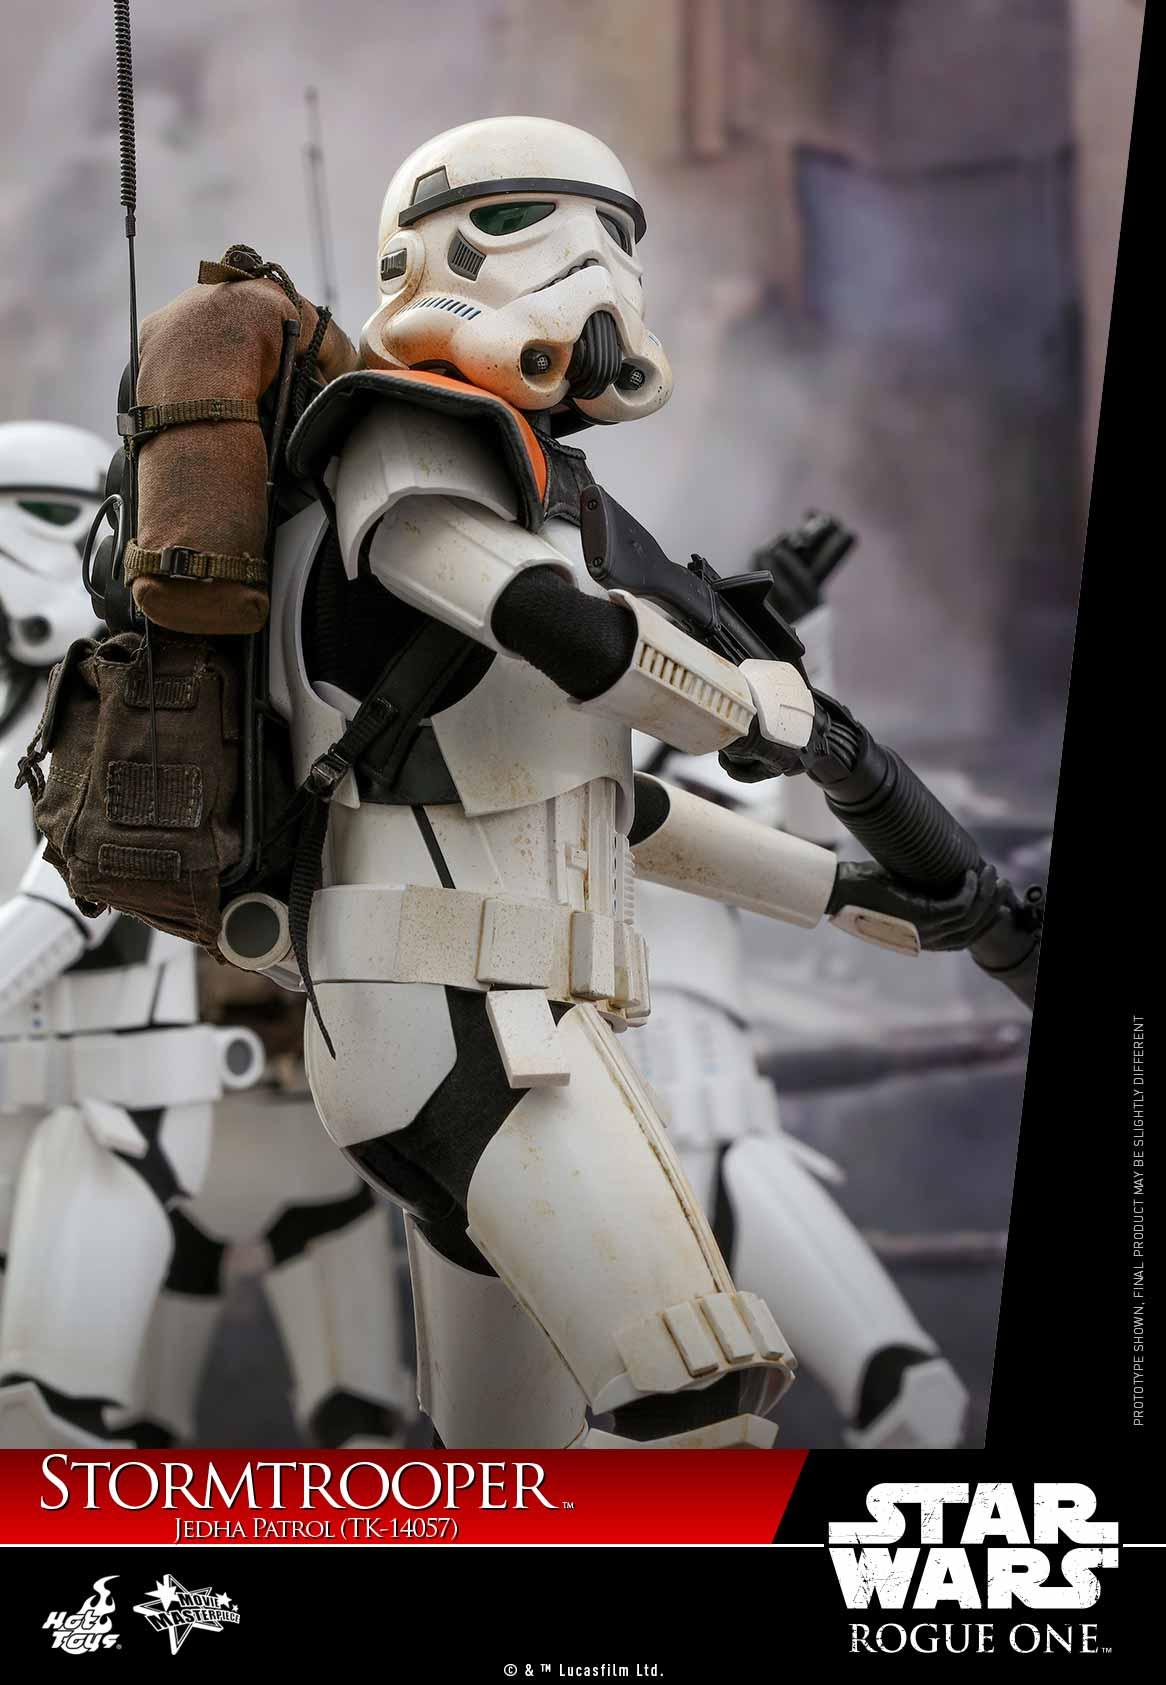 hot-toys-swro-stormtrooper-jedha-patrol-tk-14057-collectible-figure_pr2